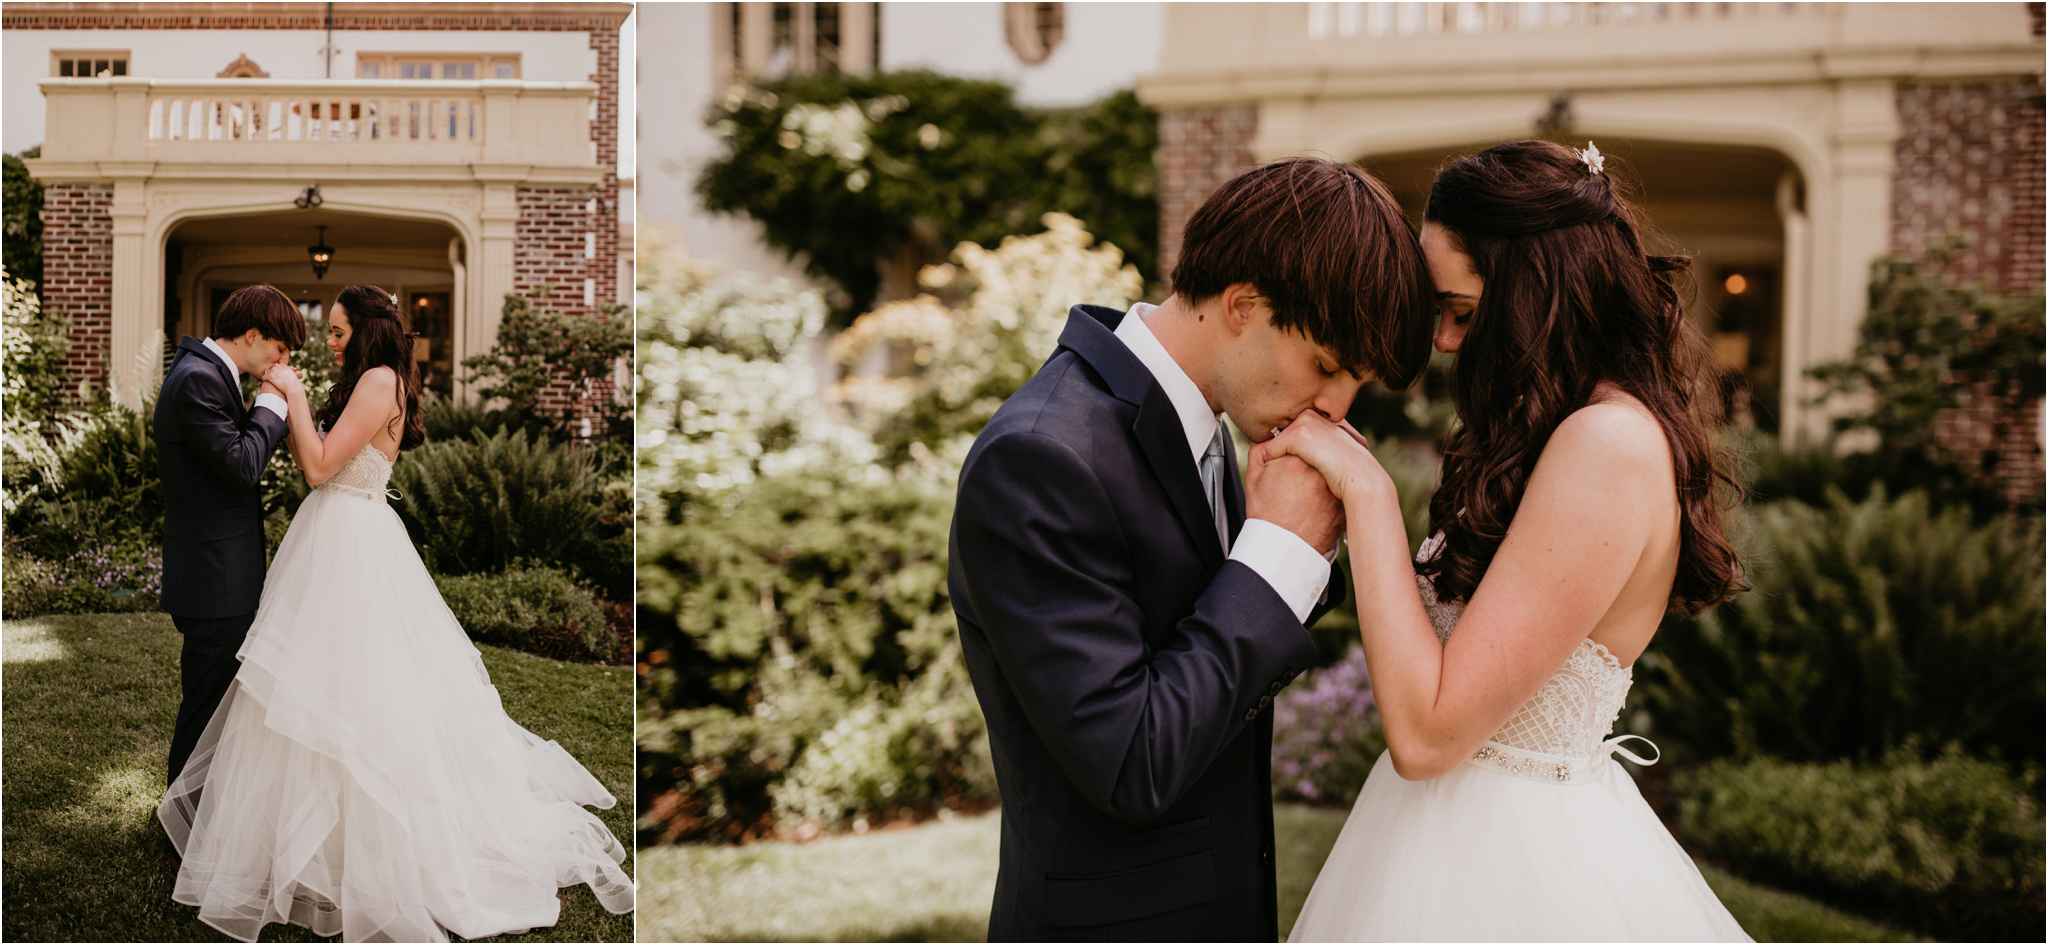 chance-and-ondrea-lairmont-manor-wedding-seattle-photographer-038.jpg